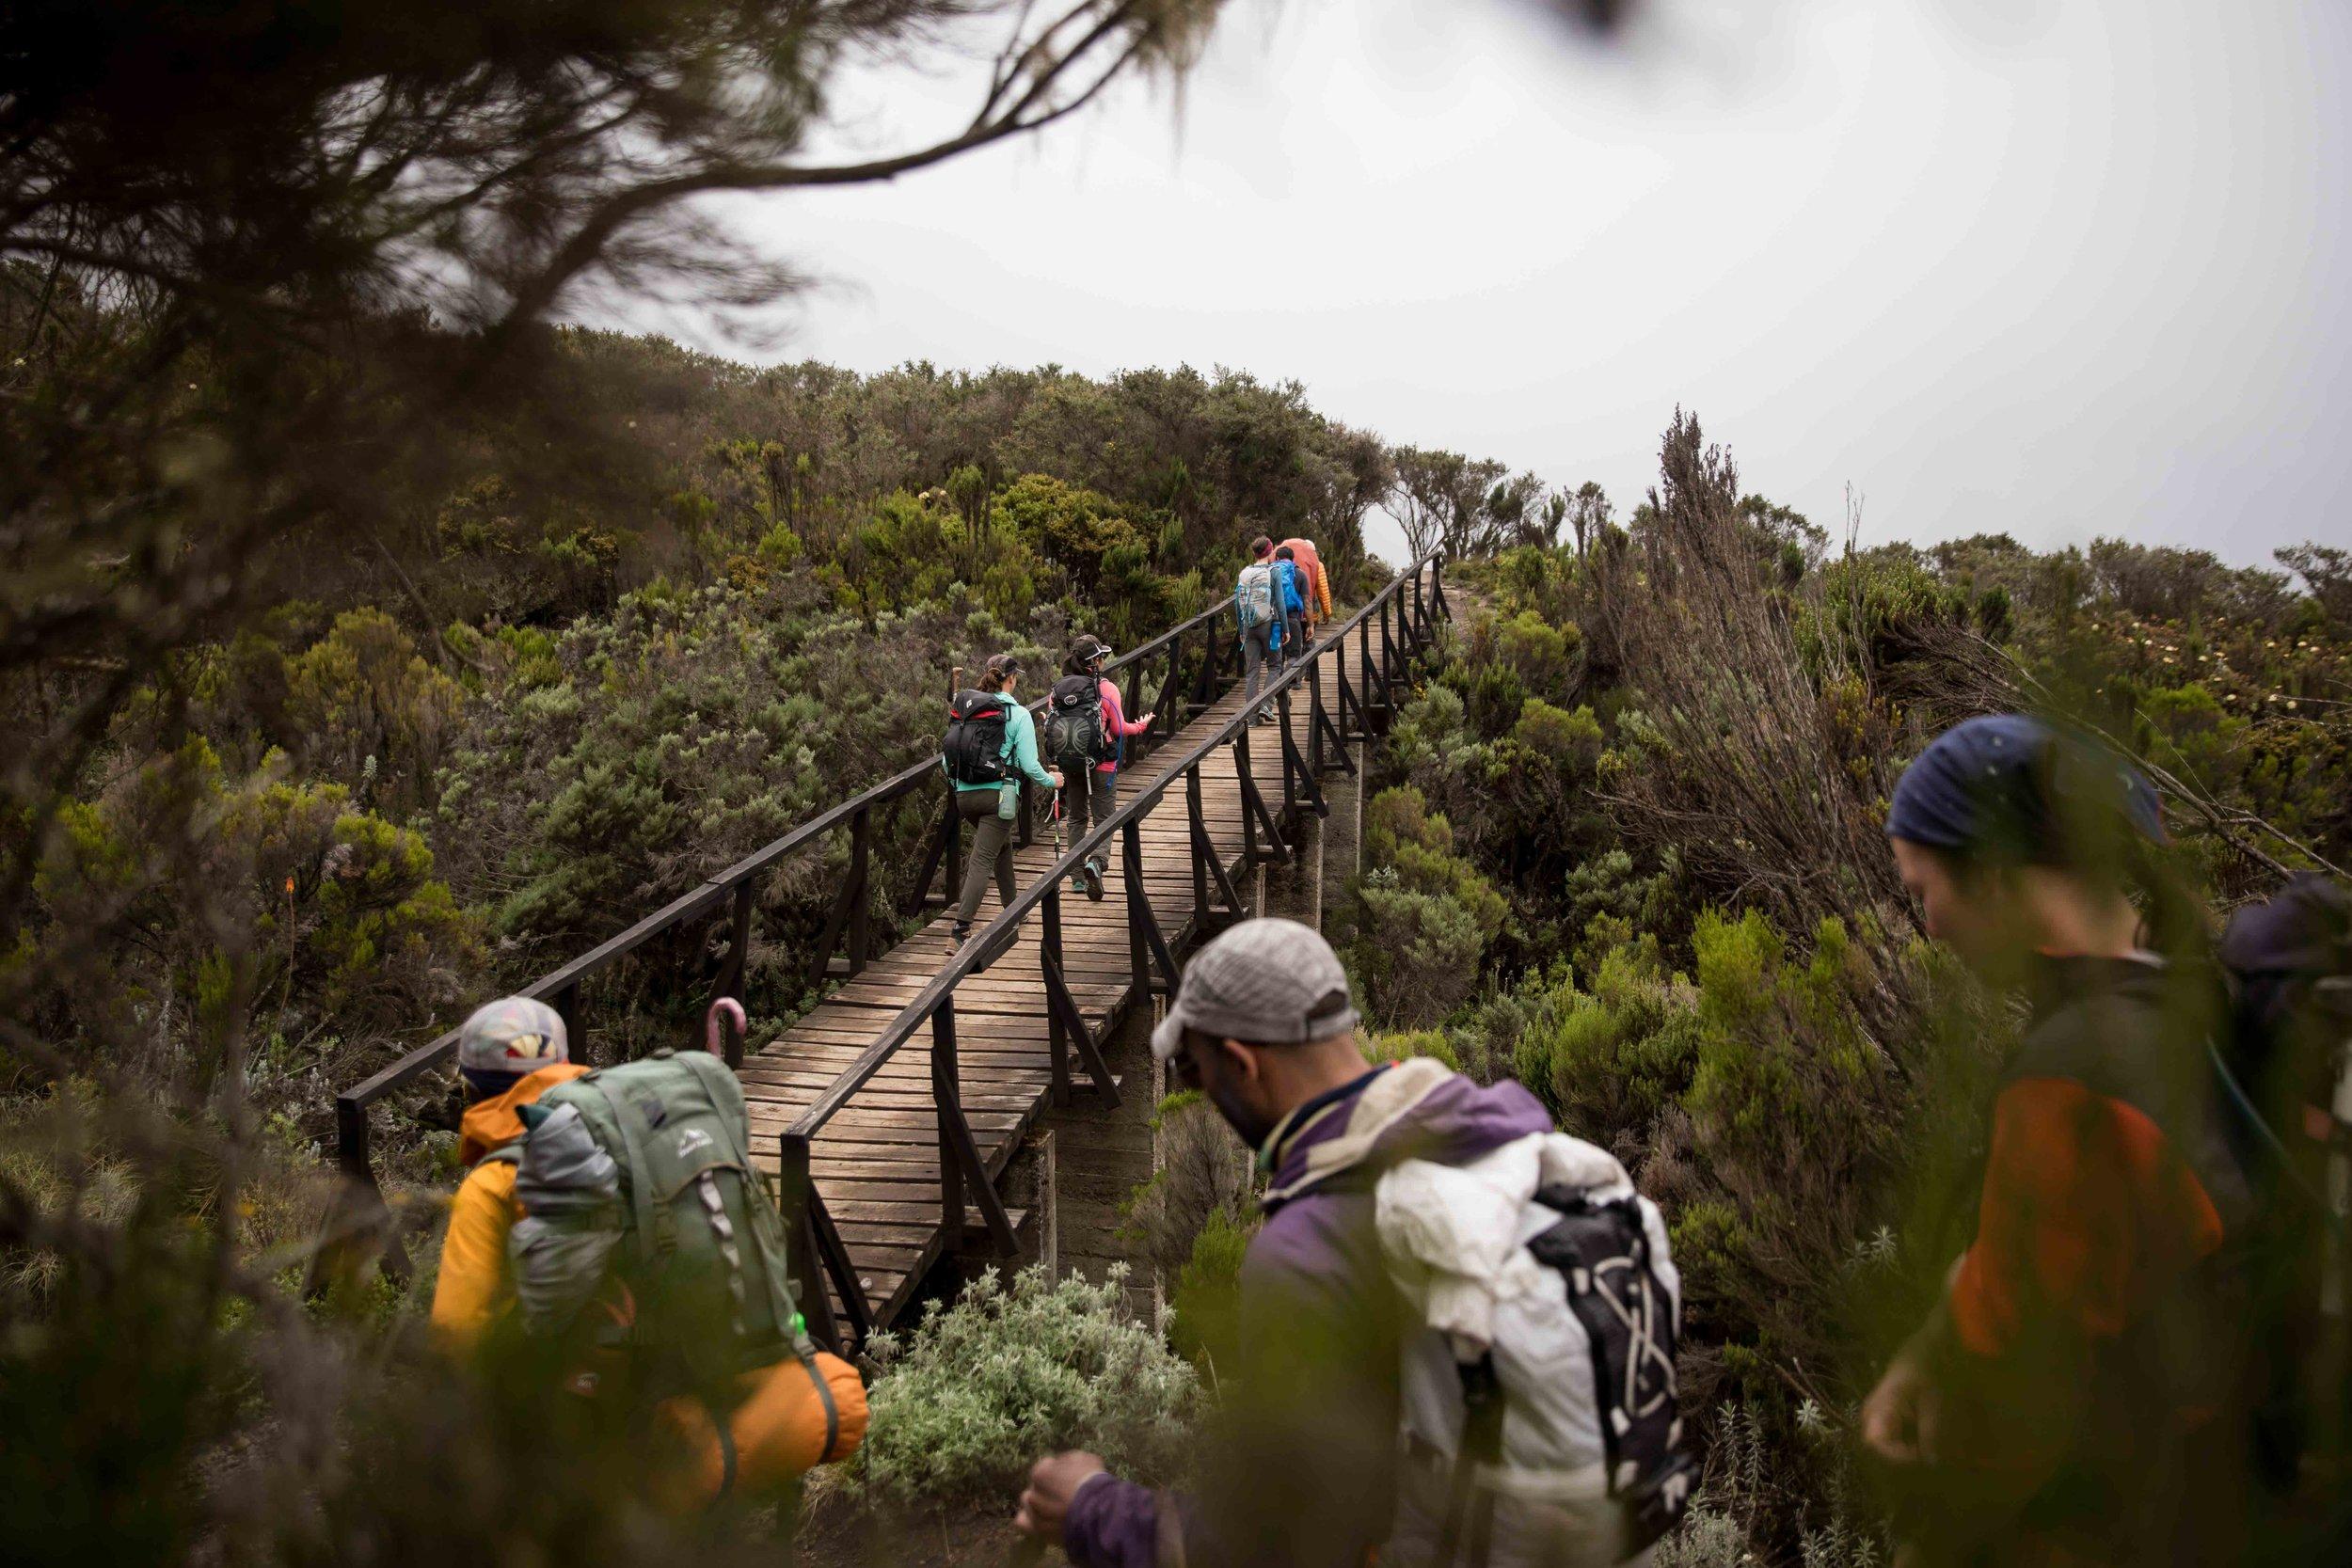 ajw_REI_Kilimanjaro-57.jpg